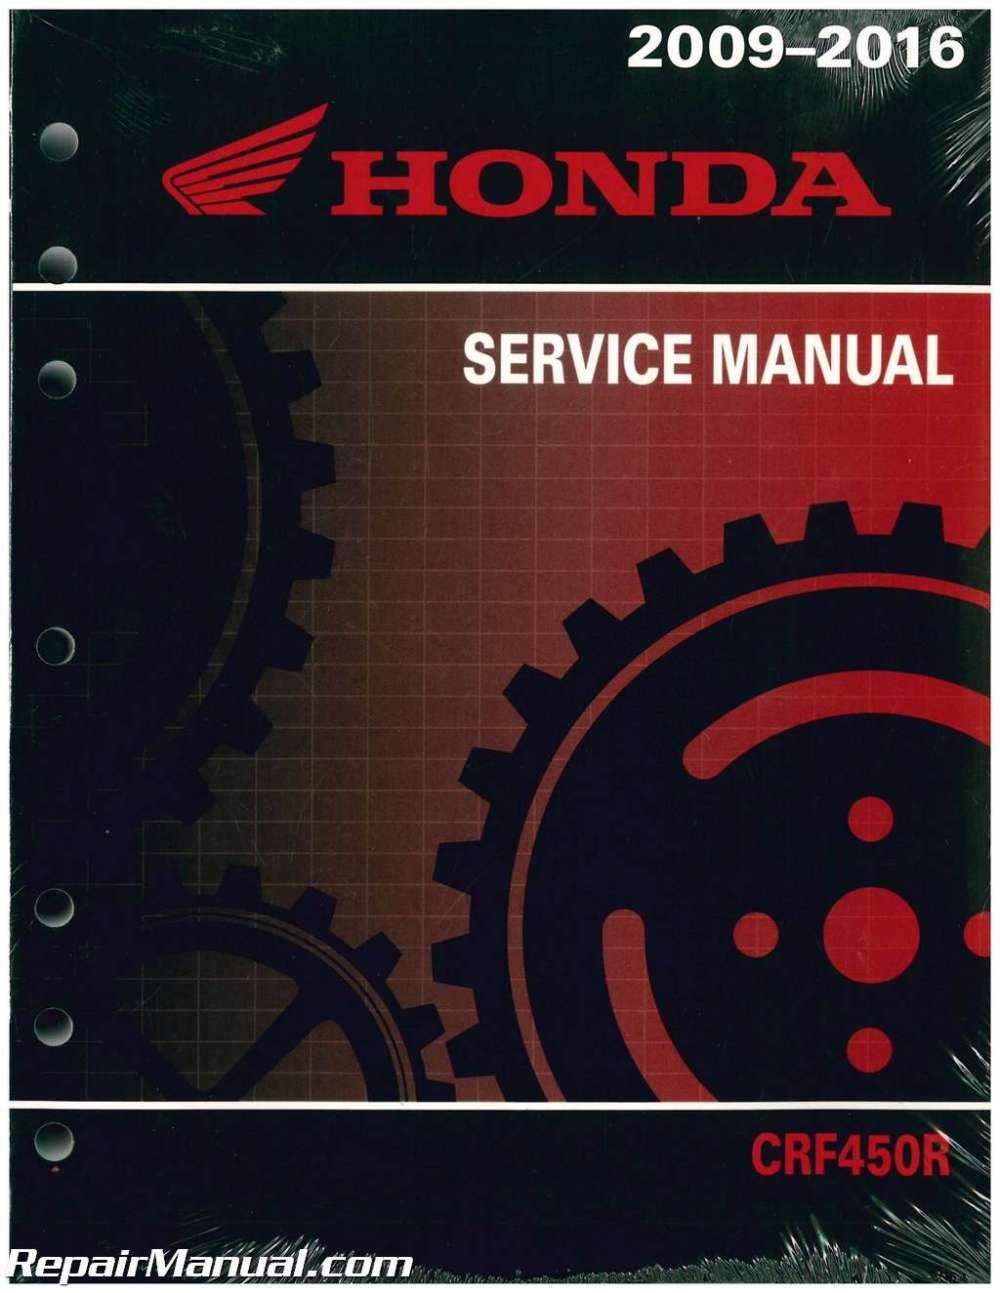 medium resolution of 2009 2016 honda crf450r motorcycle service manual2009 2016 honda crf450r